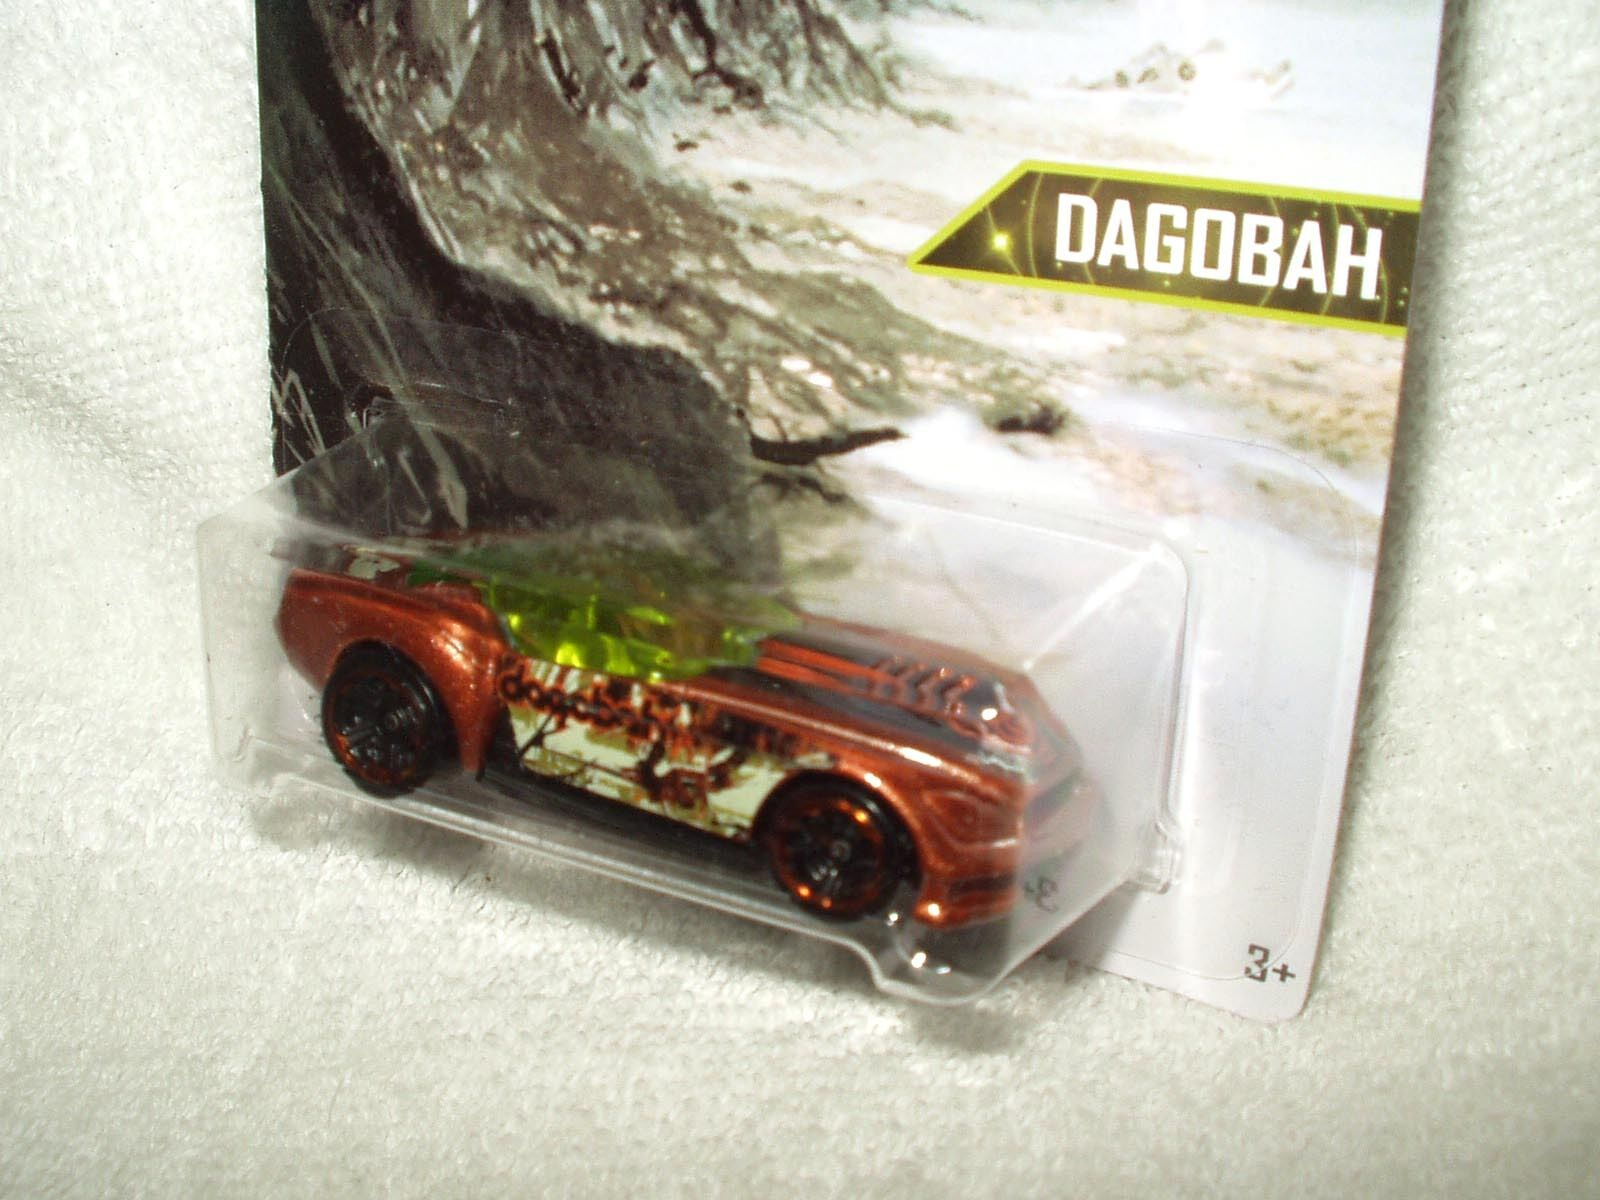 Action Figure Star Wars Hot Wheels Dagobah Vehicle Car Dagobah Wheels Pony-Up 5 of 8 34c6c7